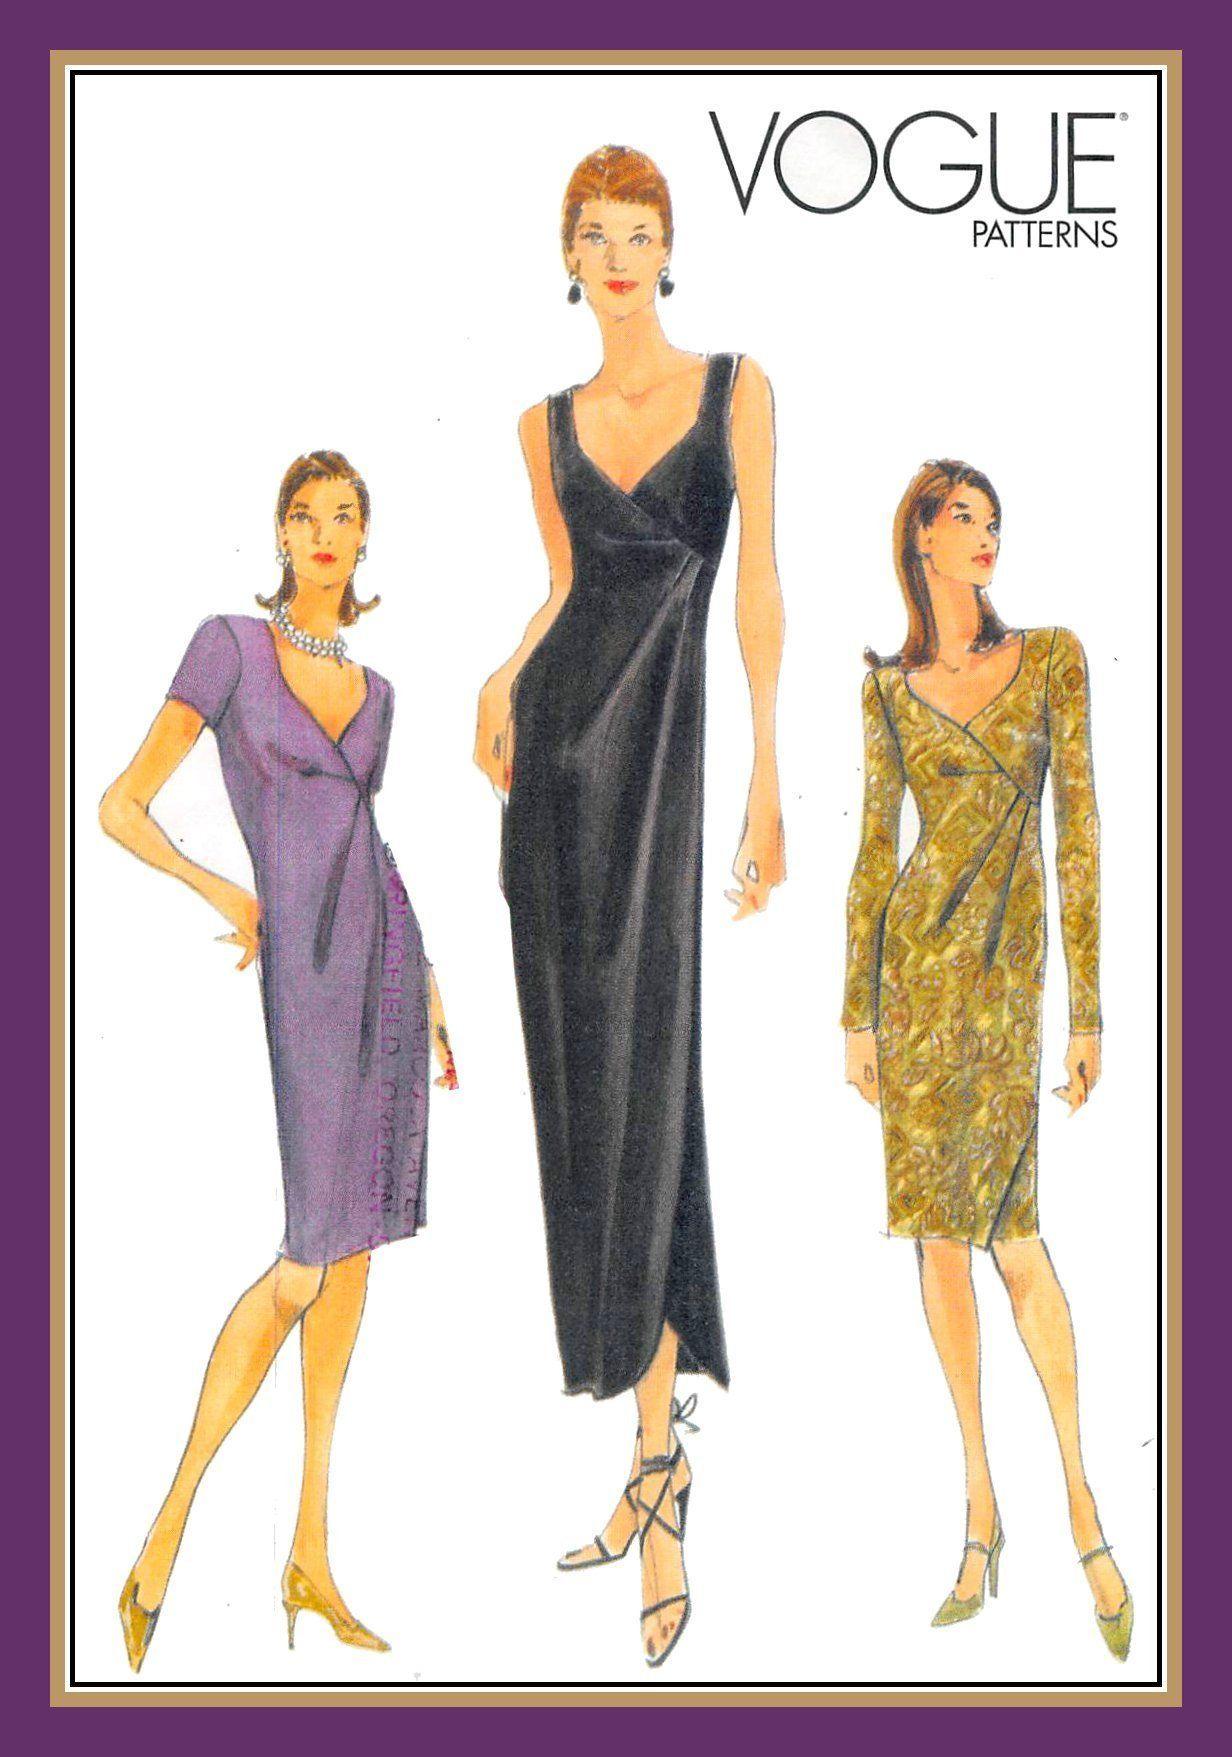 Vintage 1998 Evening Wrap Dress Vogue Sewing Pattern Bias Etsy Evening Wrap Dress Vogue Sewing Patterns Vogue Dress [ 1757 x 1232 Pixel ]